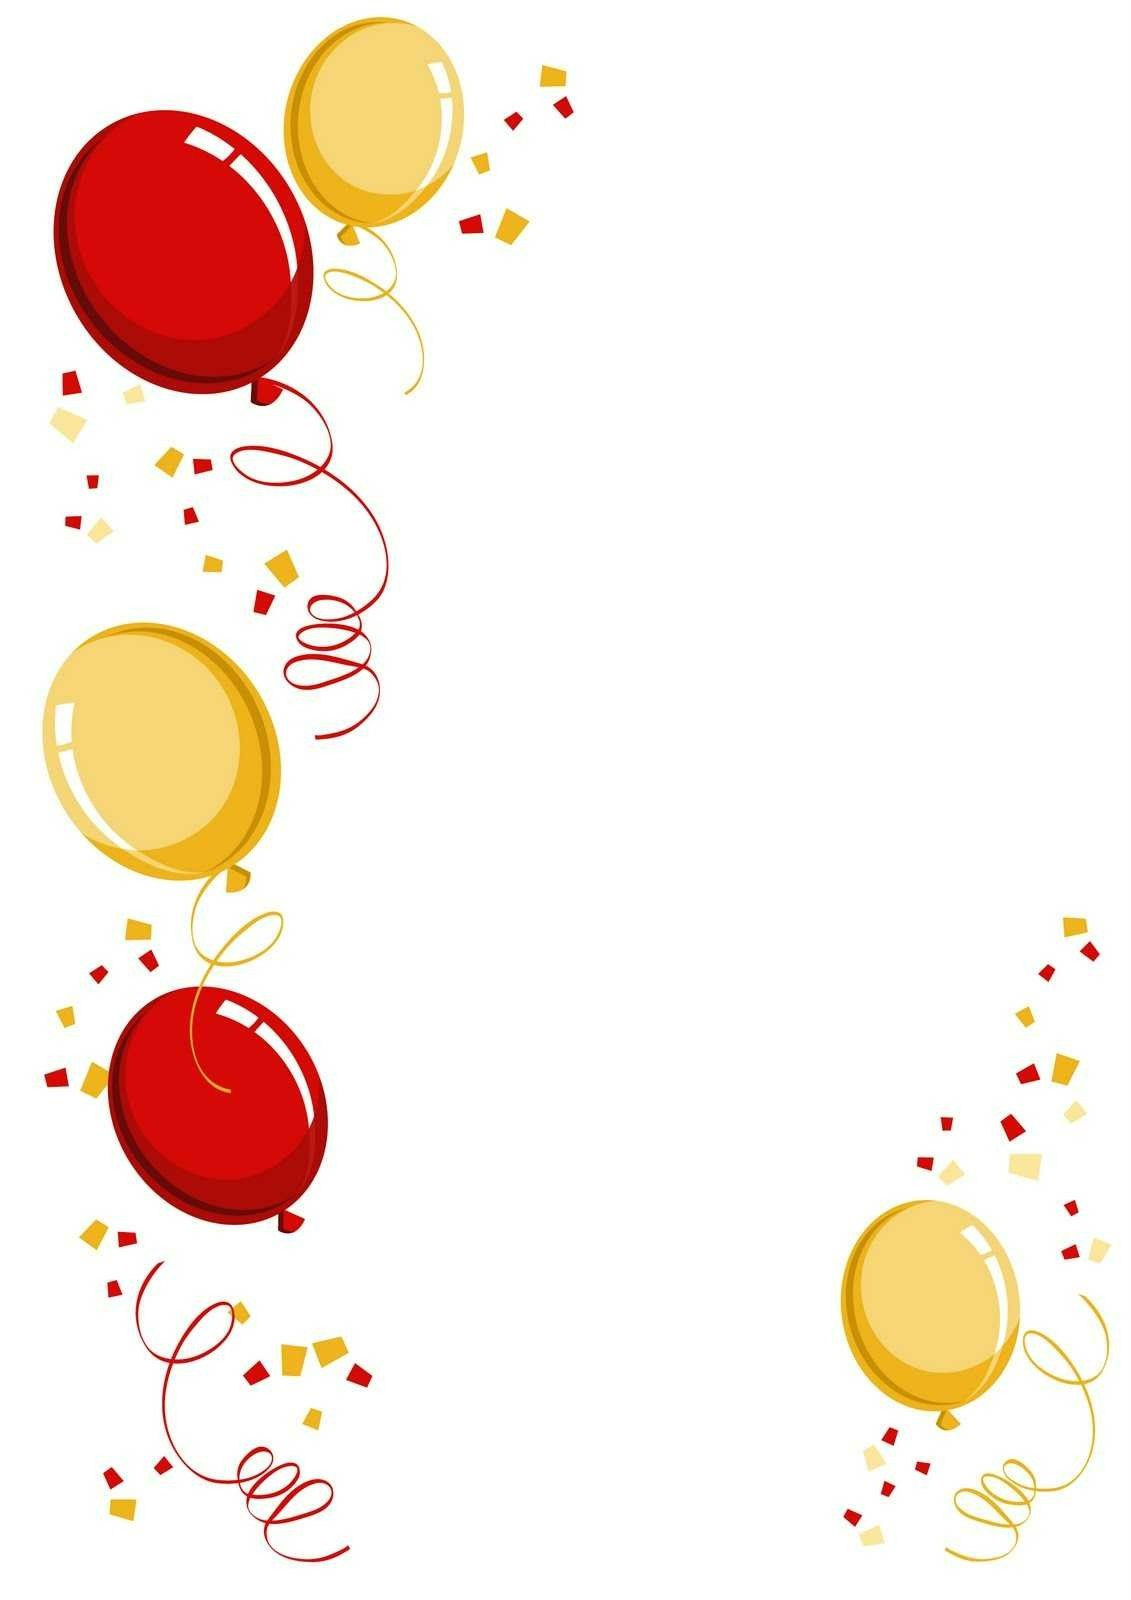 Pin Von Clotilde Miranda Auf Wallpapers Backgrounds Geburtstag Clipart Luftballons Geburtstag Luftballons